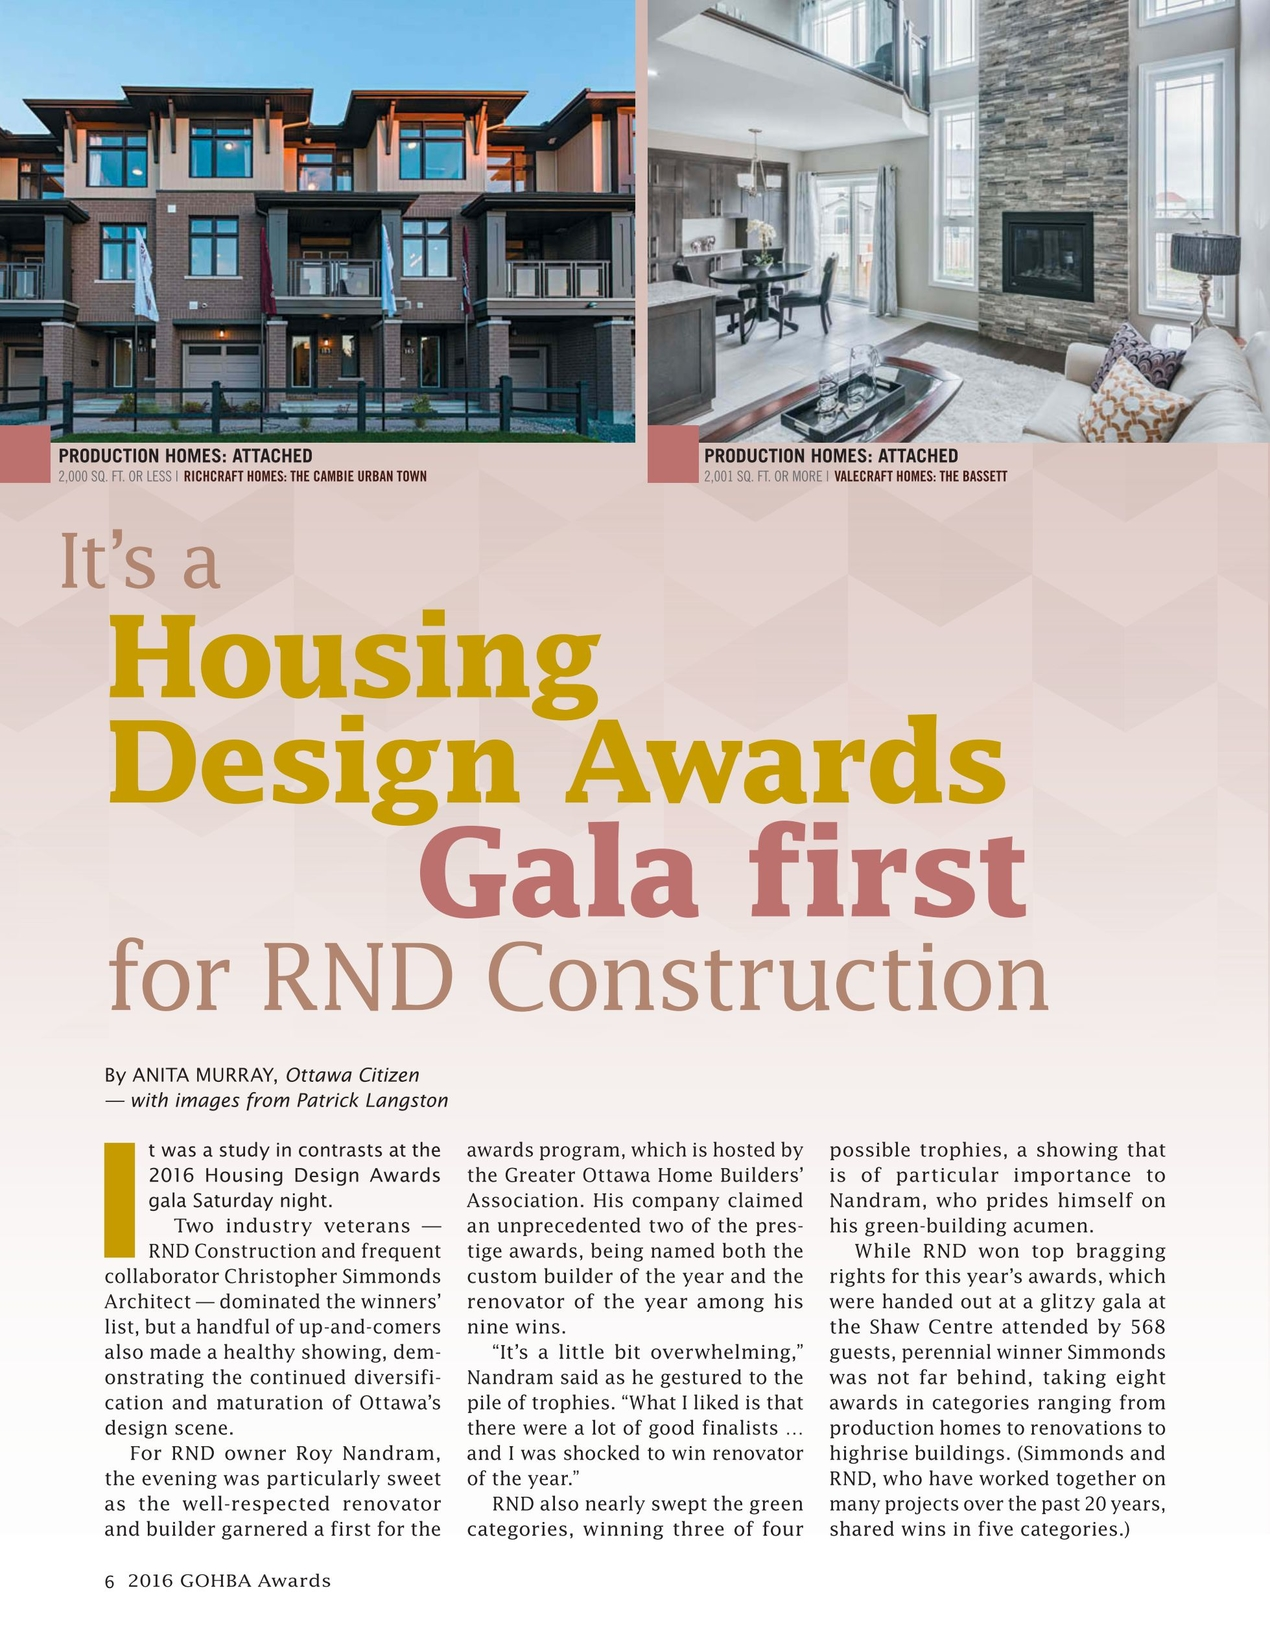 2016 GOHBA Housing Design Awards on royal design homes, green design homes, golden design homes,